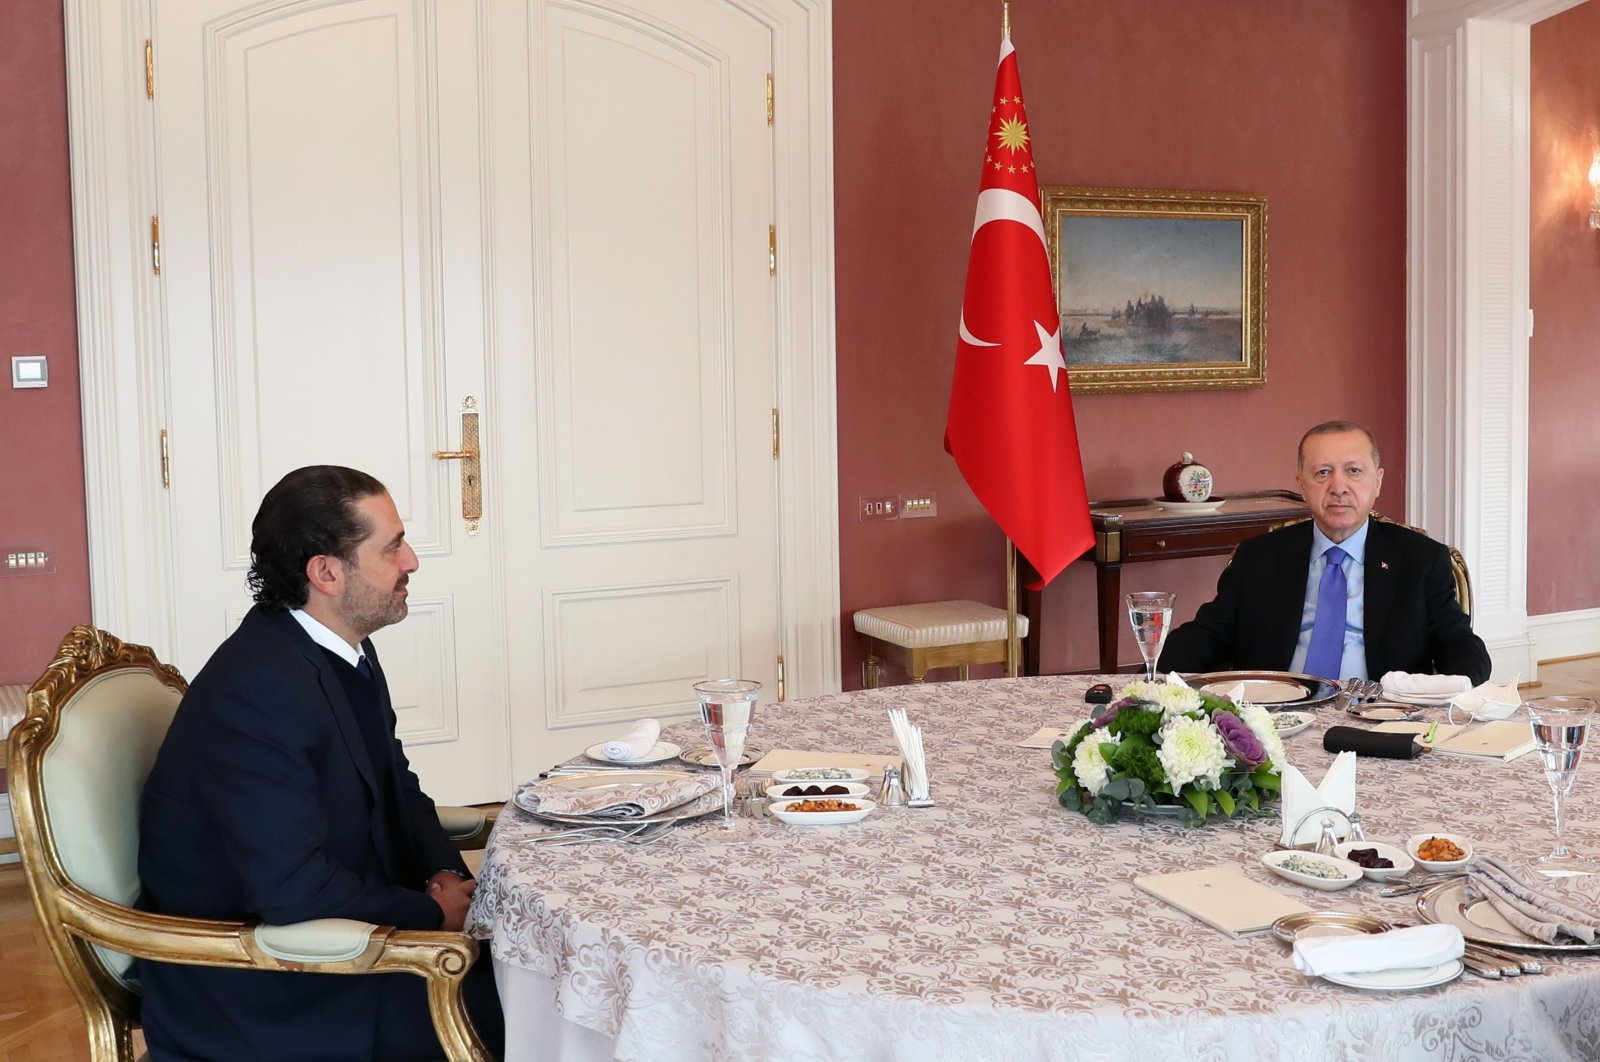 President Recep Tayyip Erdoğan (R) meets with Lebanese former Prime Minister Saad Hariri (L) at Vahdettin Mansion in Istanbul, Jan. 8, 2021. (AFP)